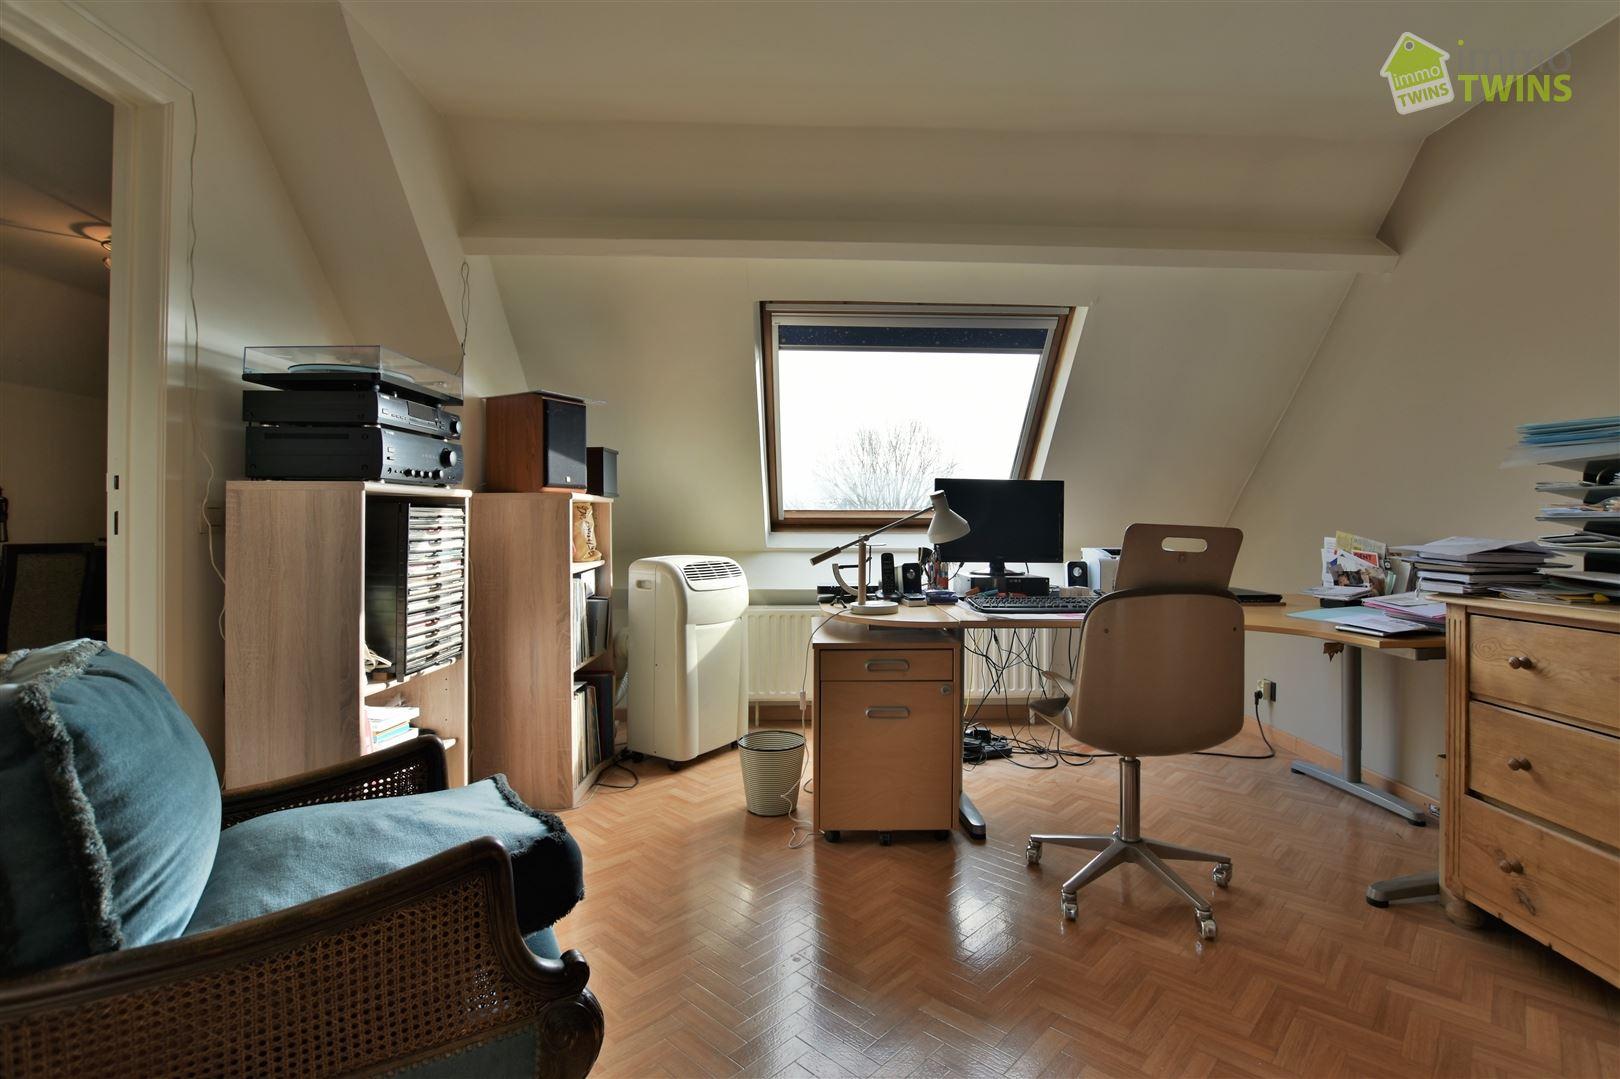 Foto 27 : Duplex/triplex te 9200 Dendermonde (België) - Prijs € 398.000